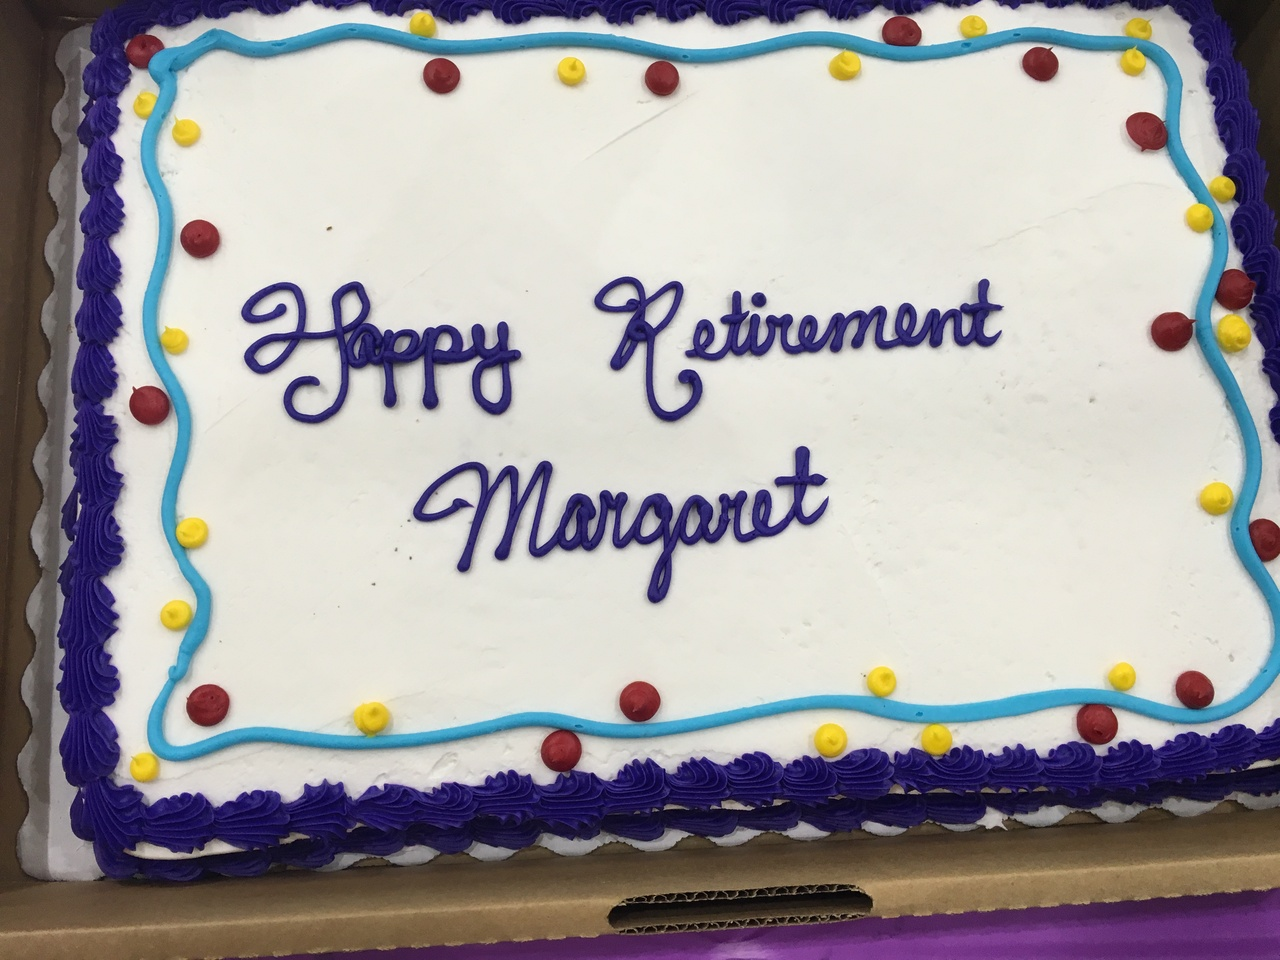 DOWNLITE Says Goodbye to Margaret